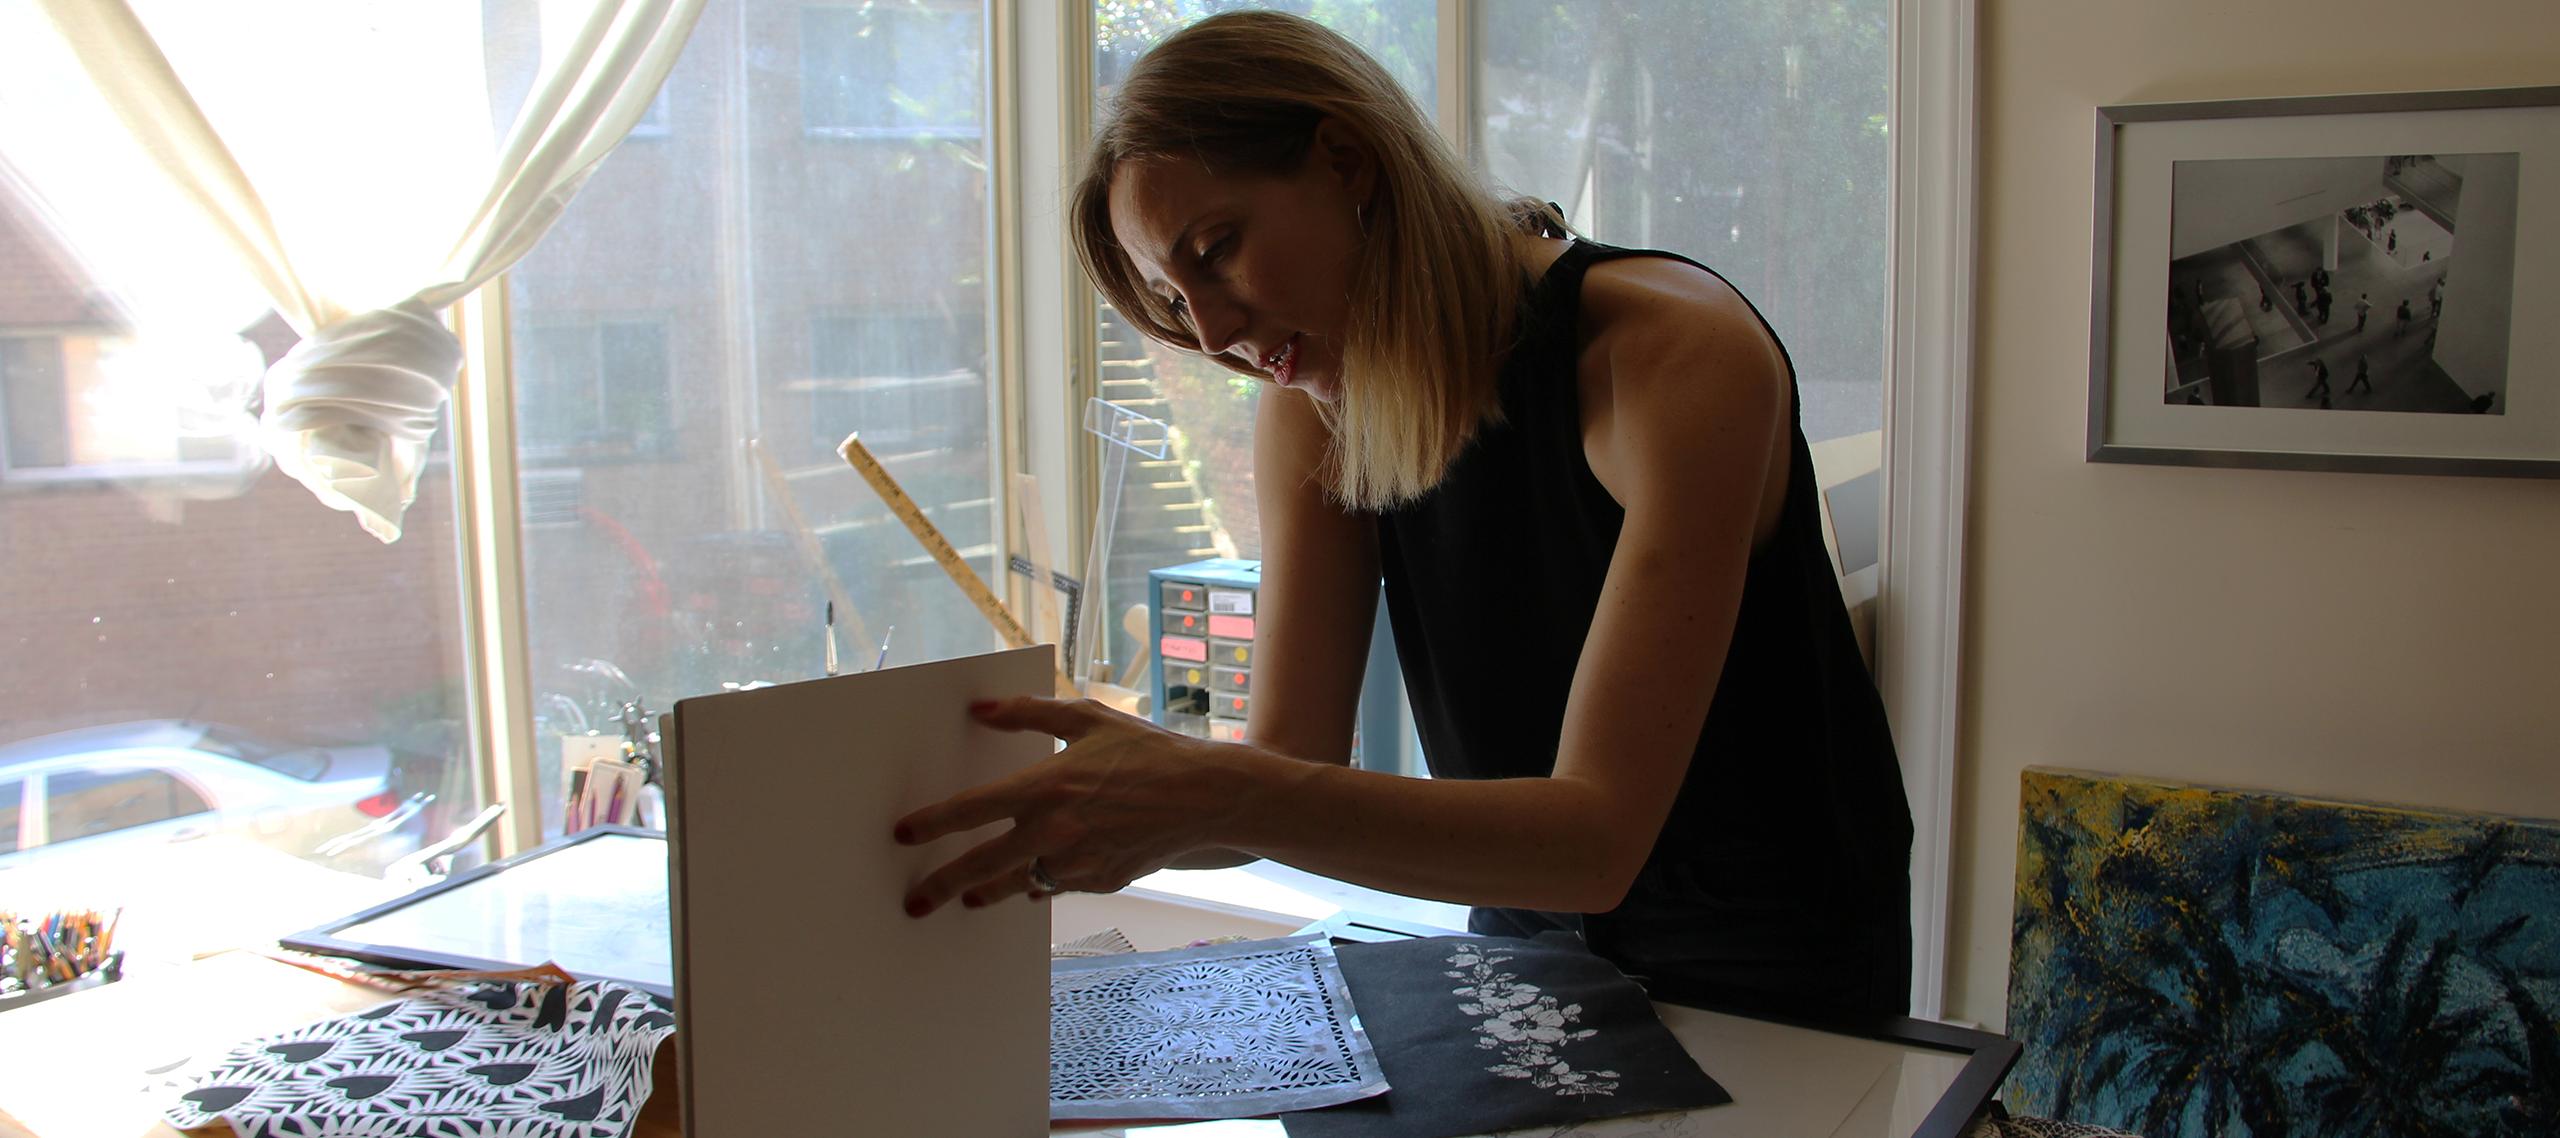 Eva Calonder in her home studio; Photo by Adriana Regalado